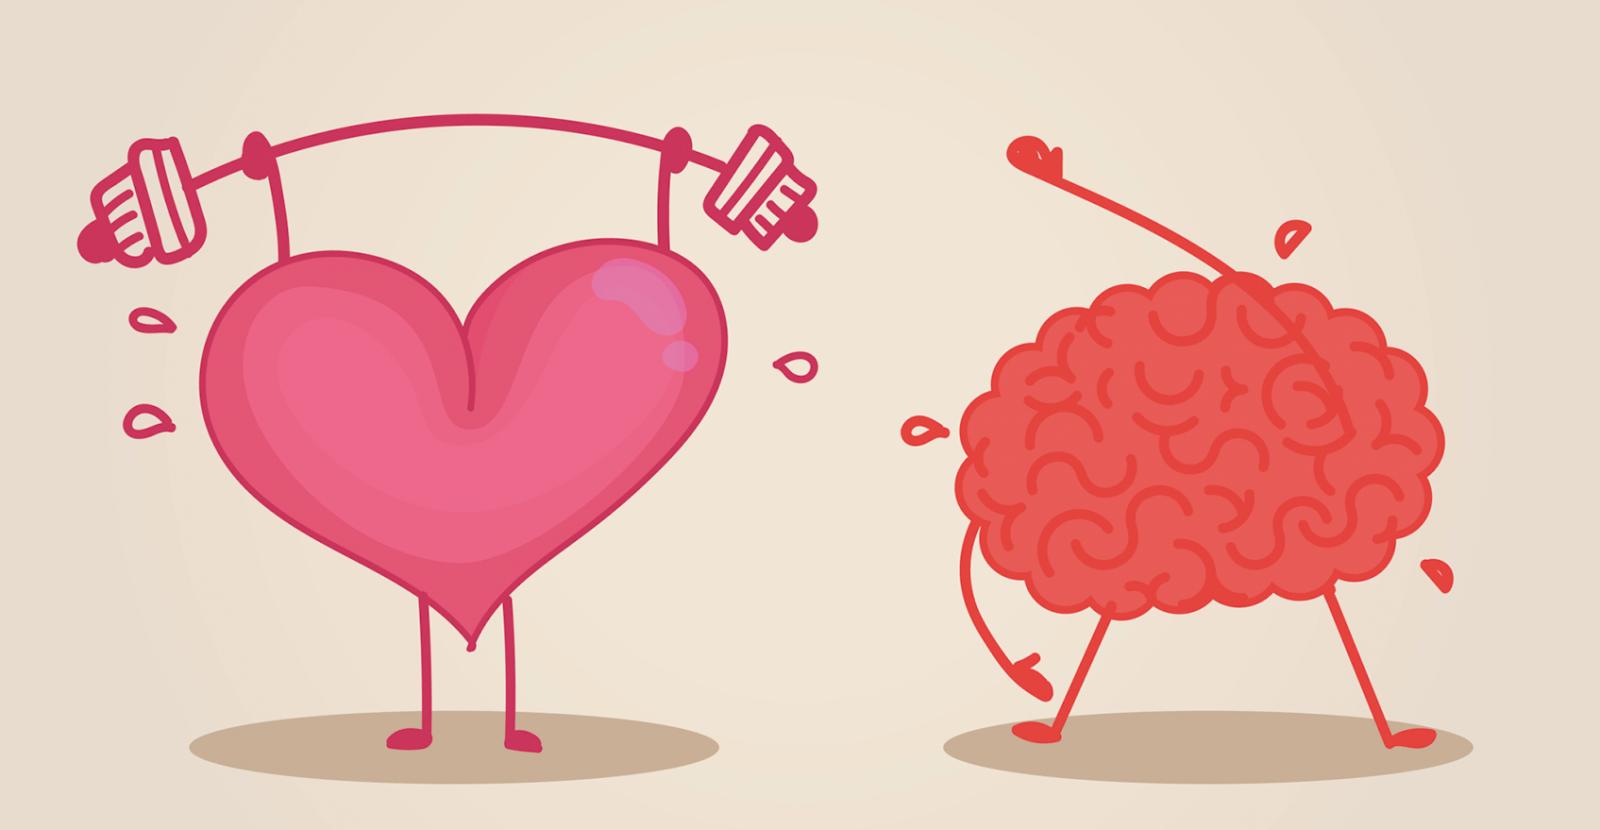 heart-workout-heart-health-memory